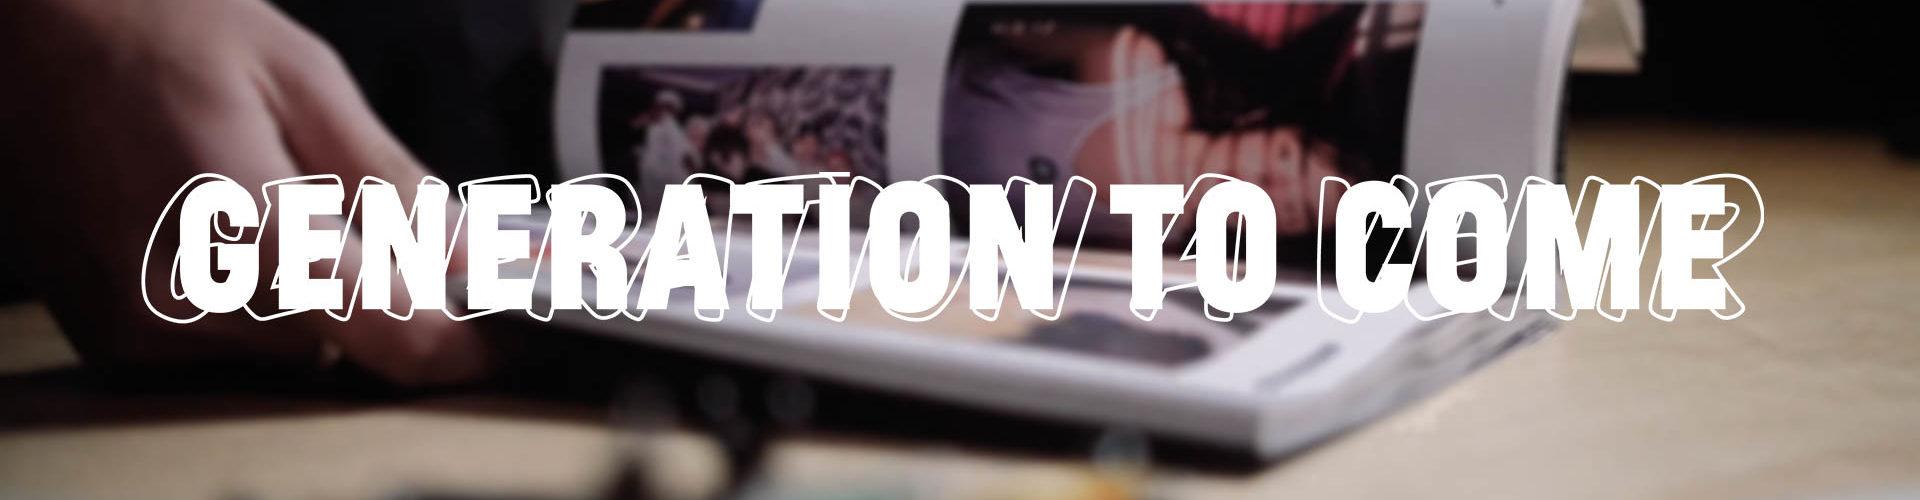 tatoo book generation to come